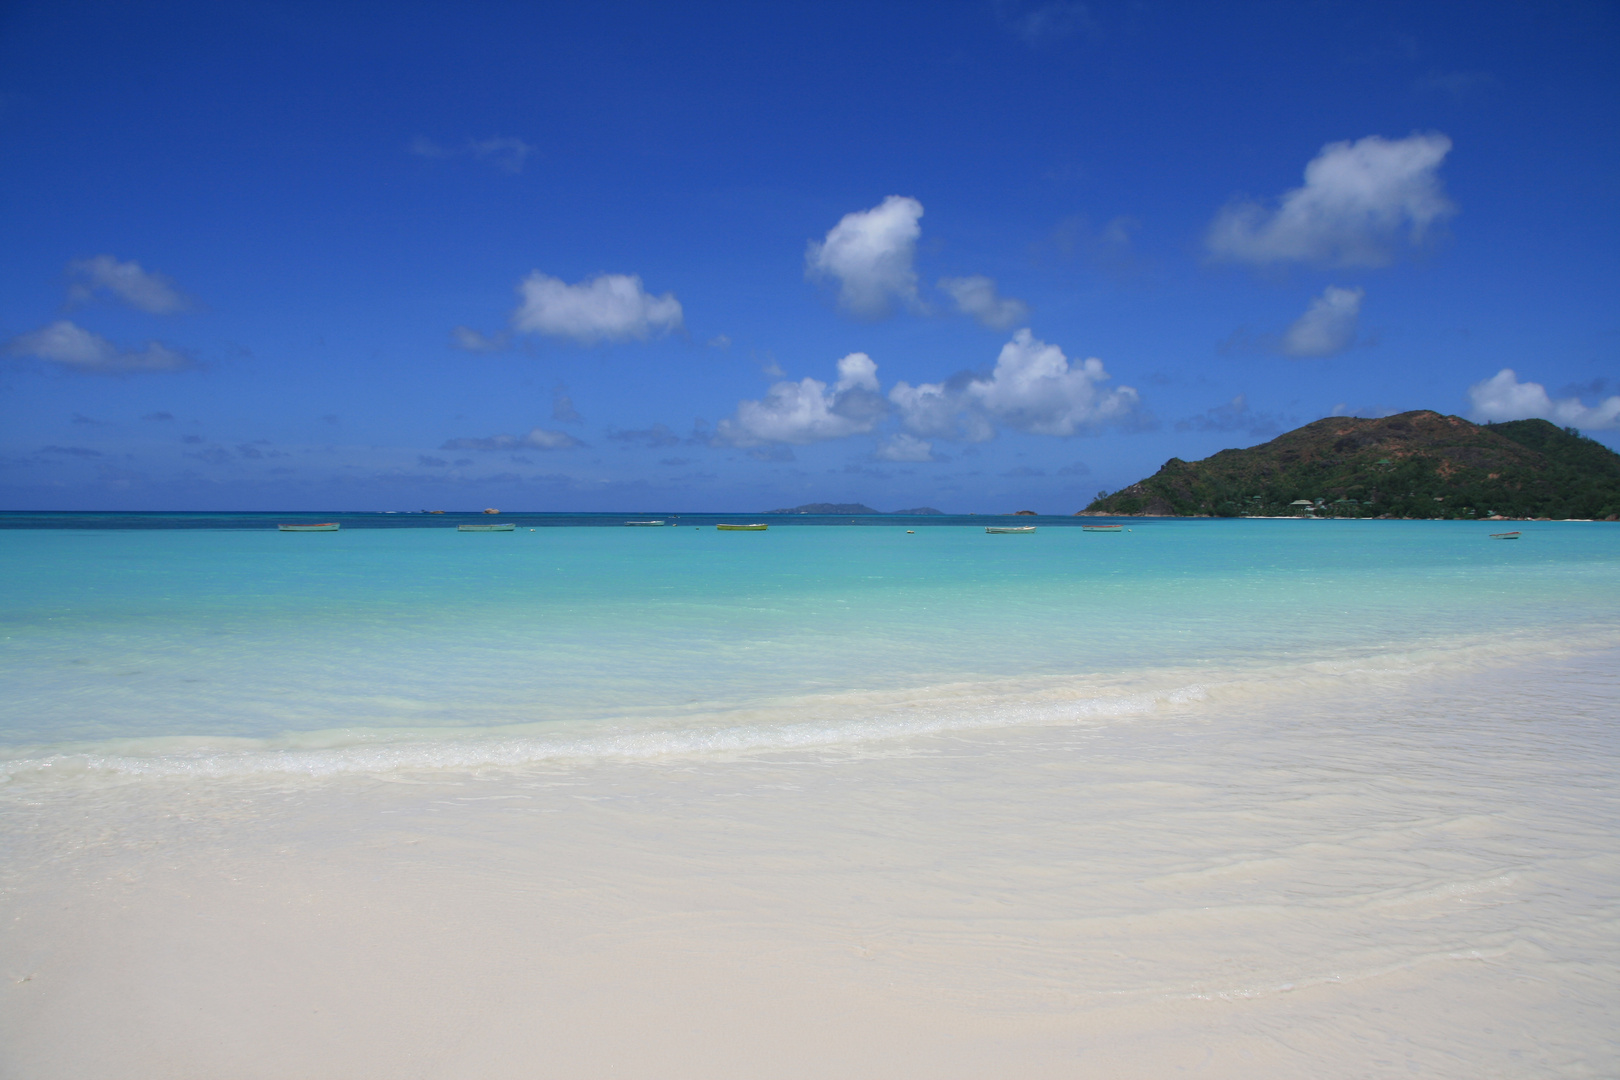 Seychellen (Insel Praslin / Anse Lazio) 09-2009